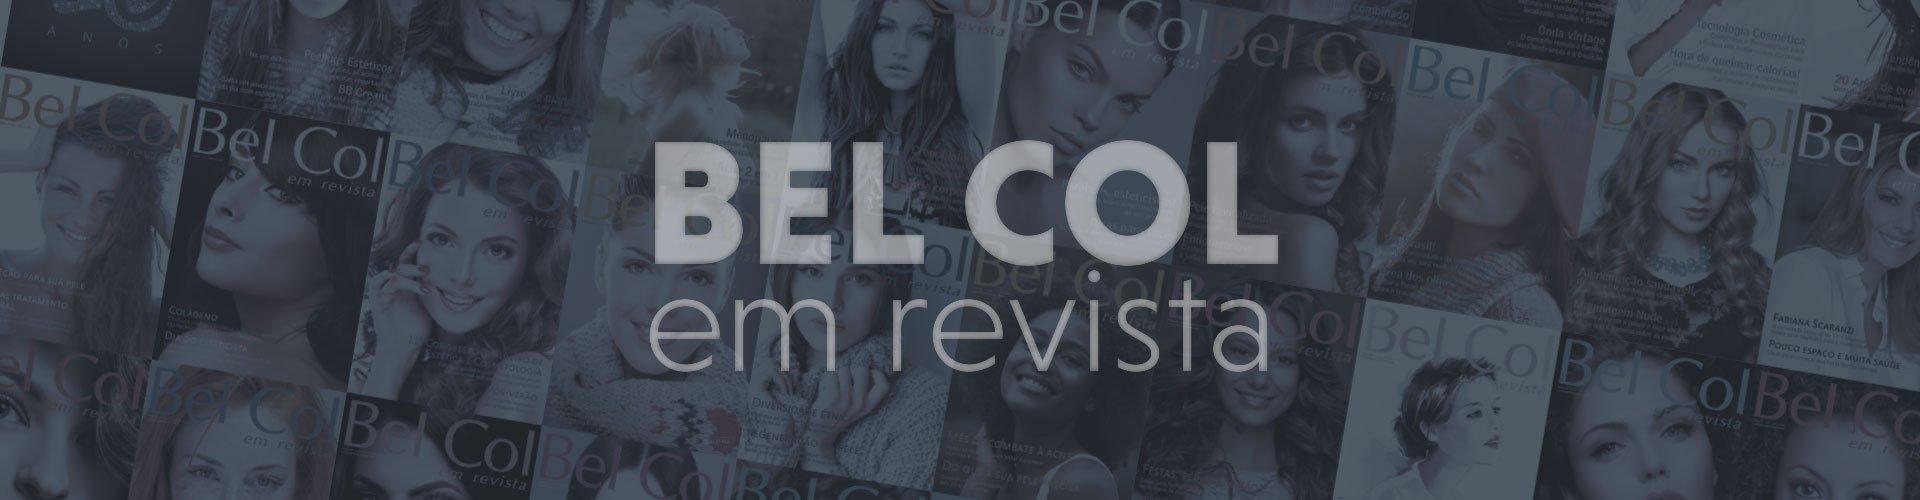 Bel Col em Revista 4